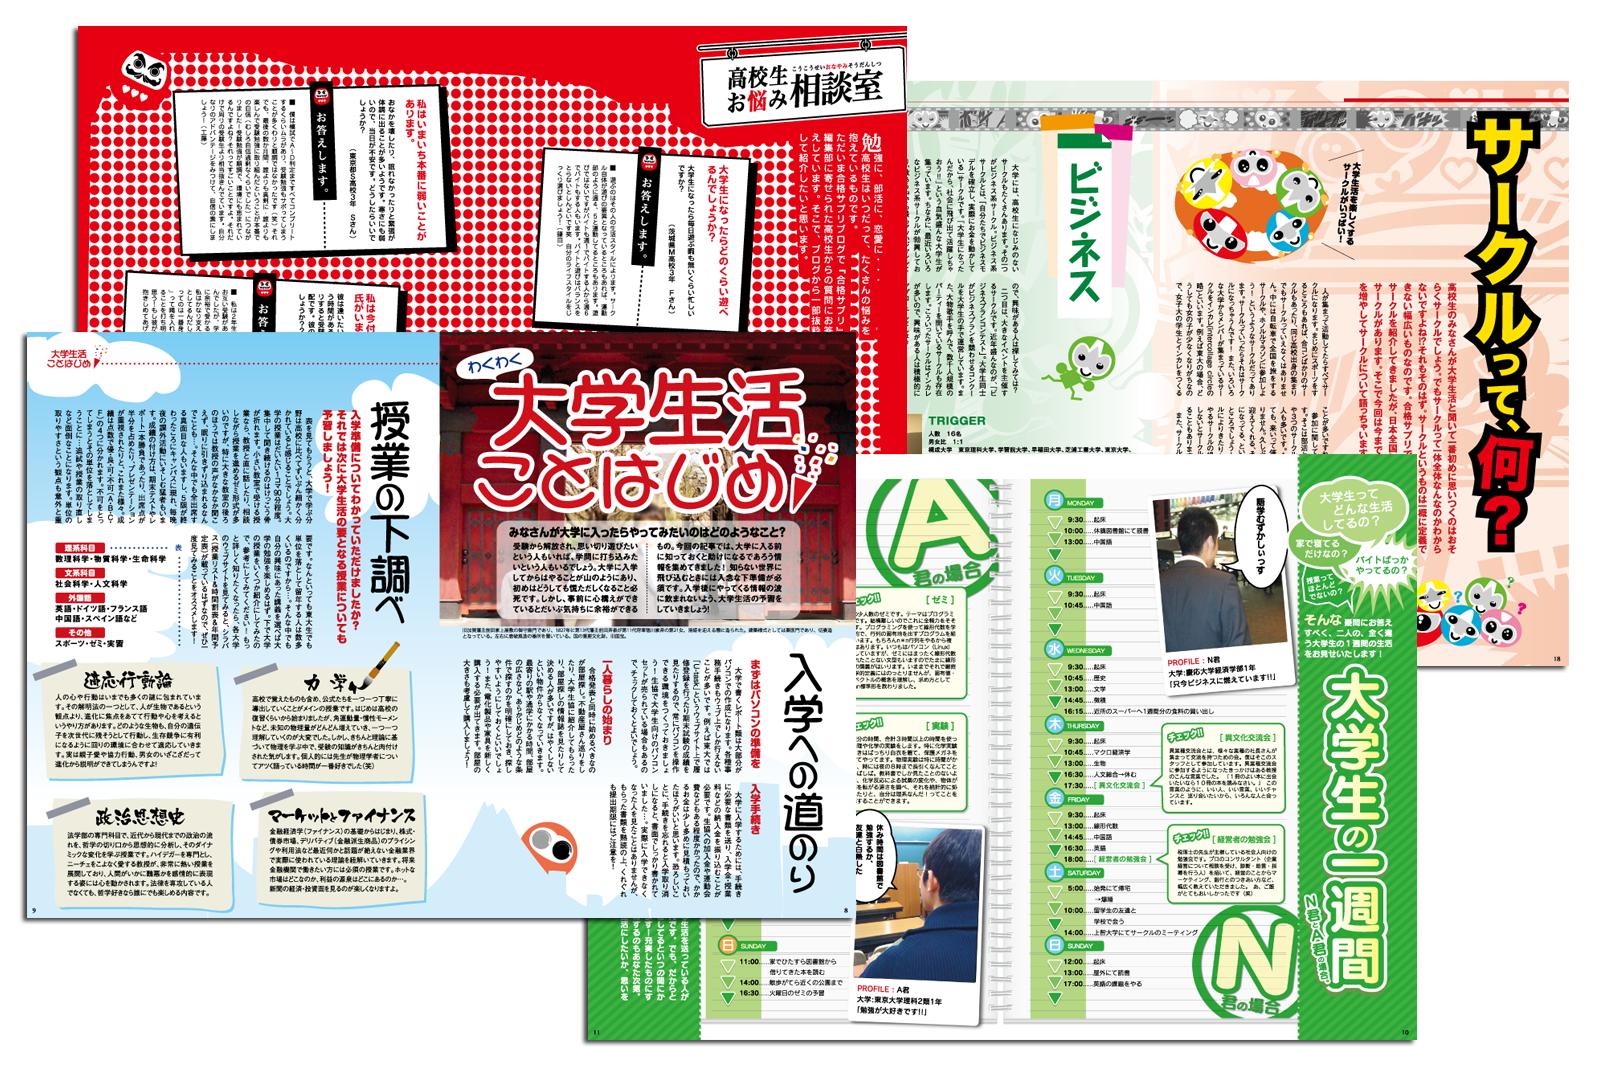 goukaku-suppli_2015-09-12_04-52-19.png